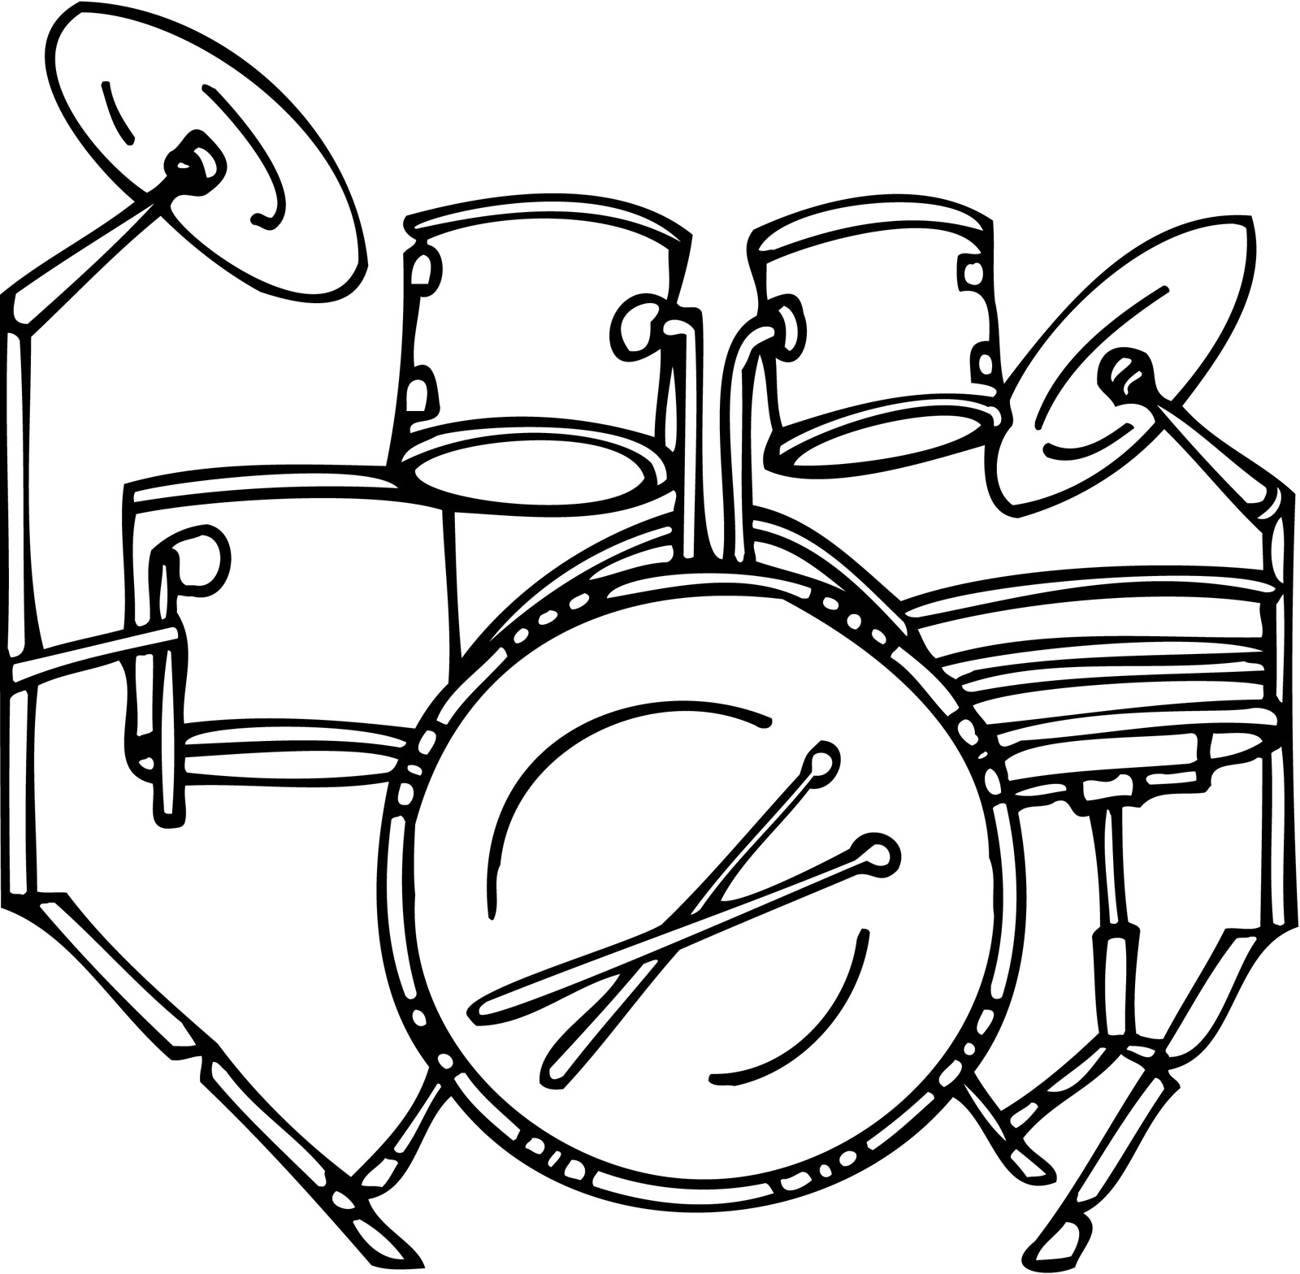 MUSIC-069